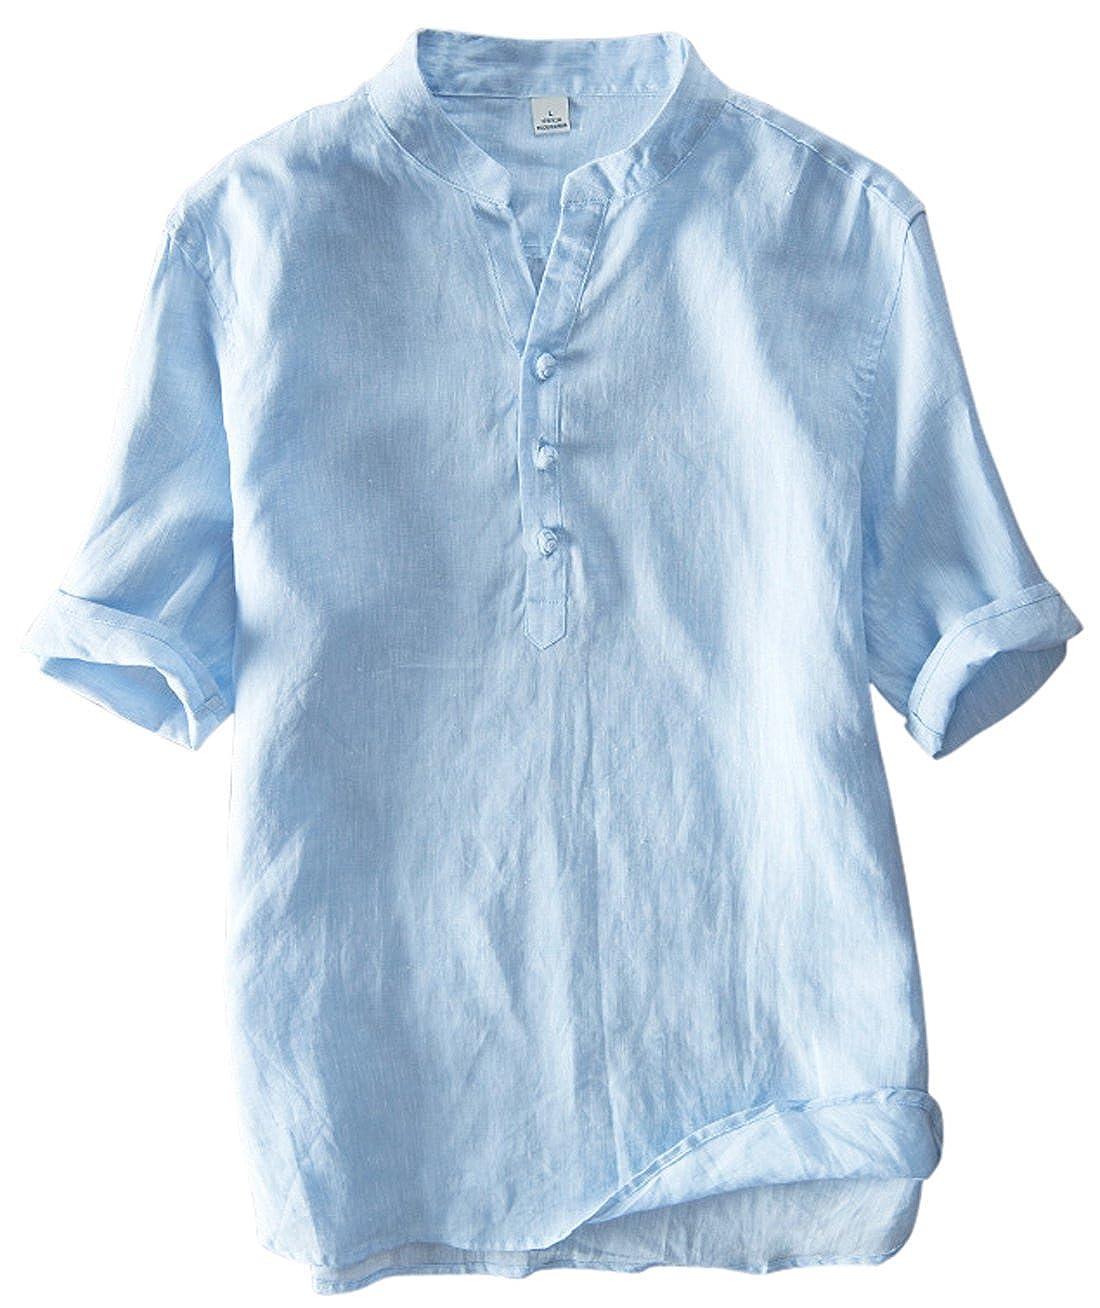 1e992139467 utcoco Men's Vintage Round Collar Chinese Style Henley Shirts Short Sleeve  Tops